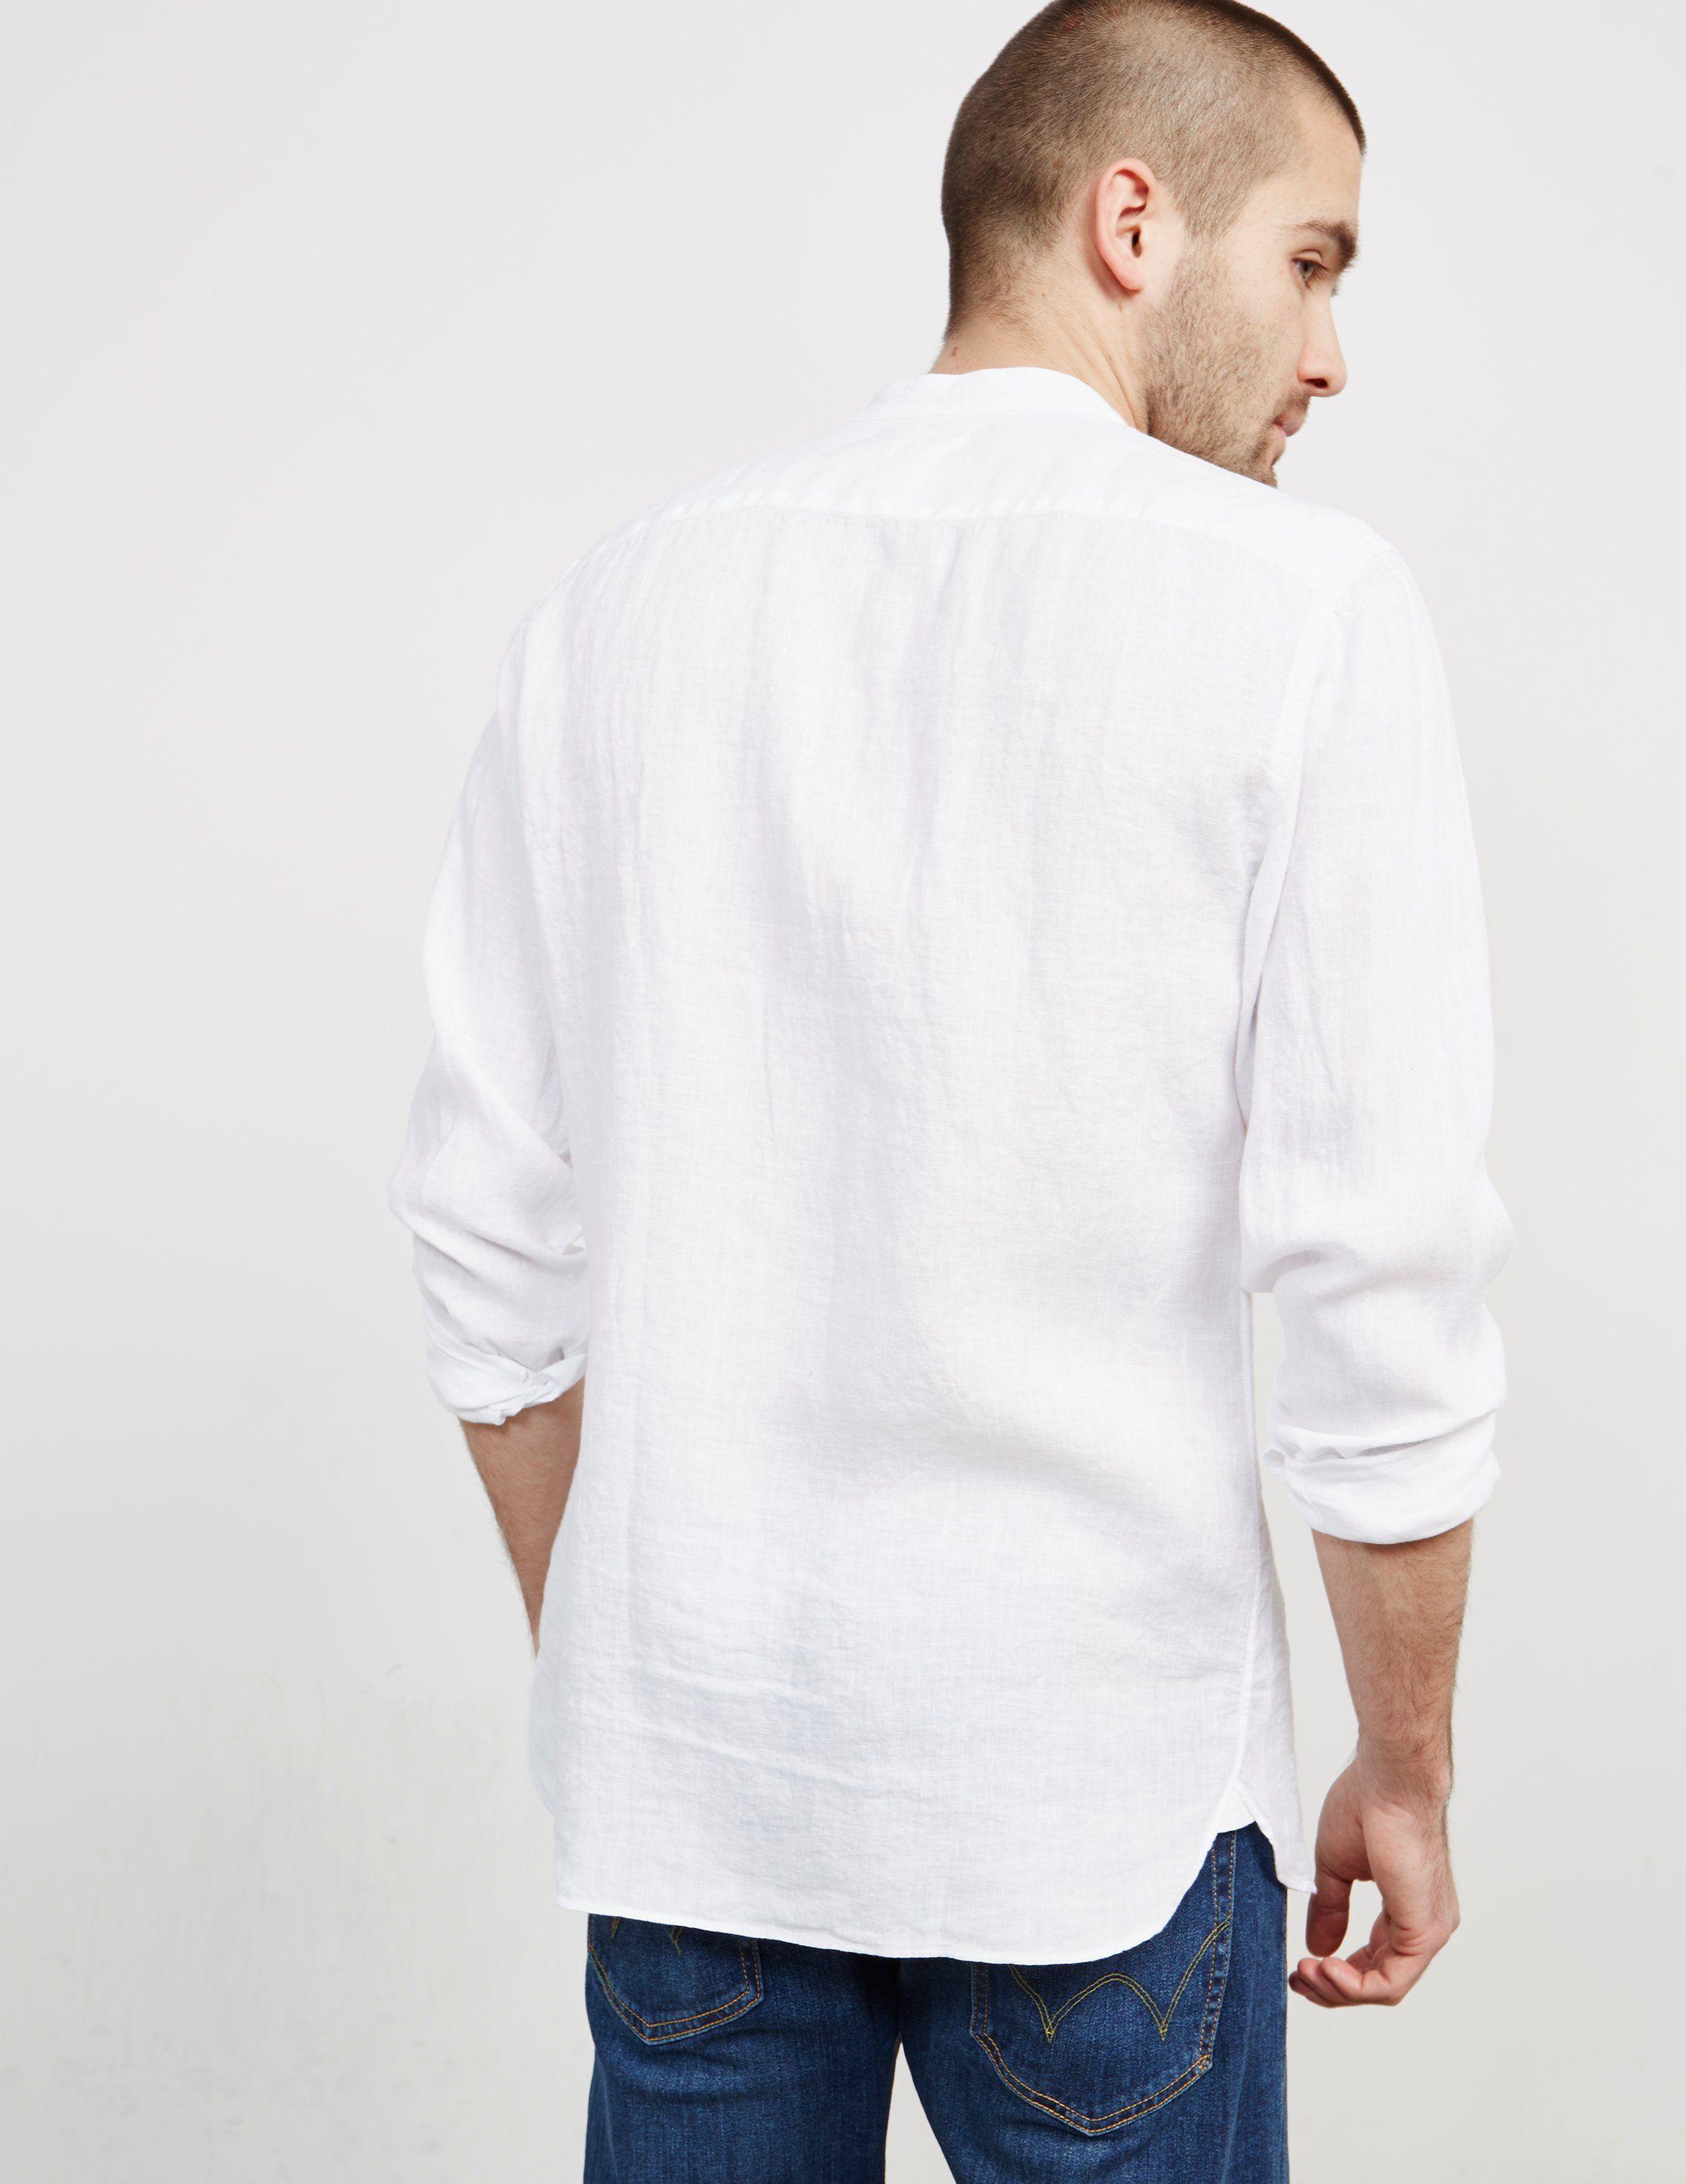 Z Zegna Guru Collar Long Sleeve Shirt